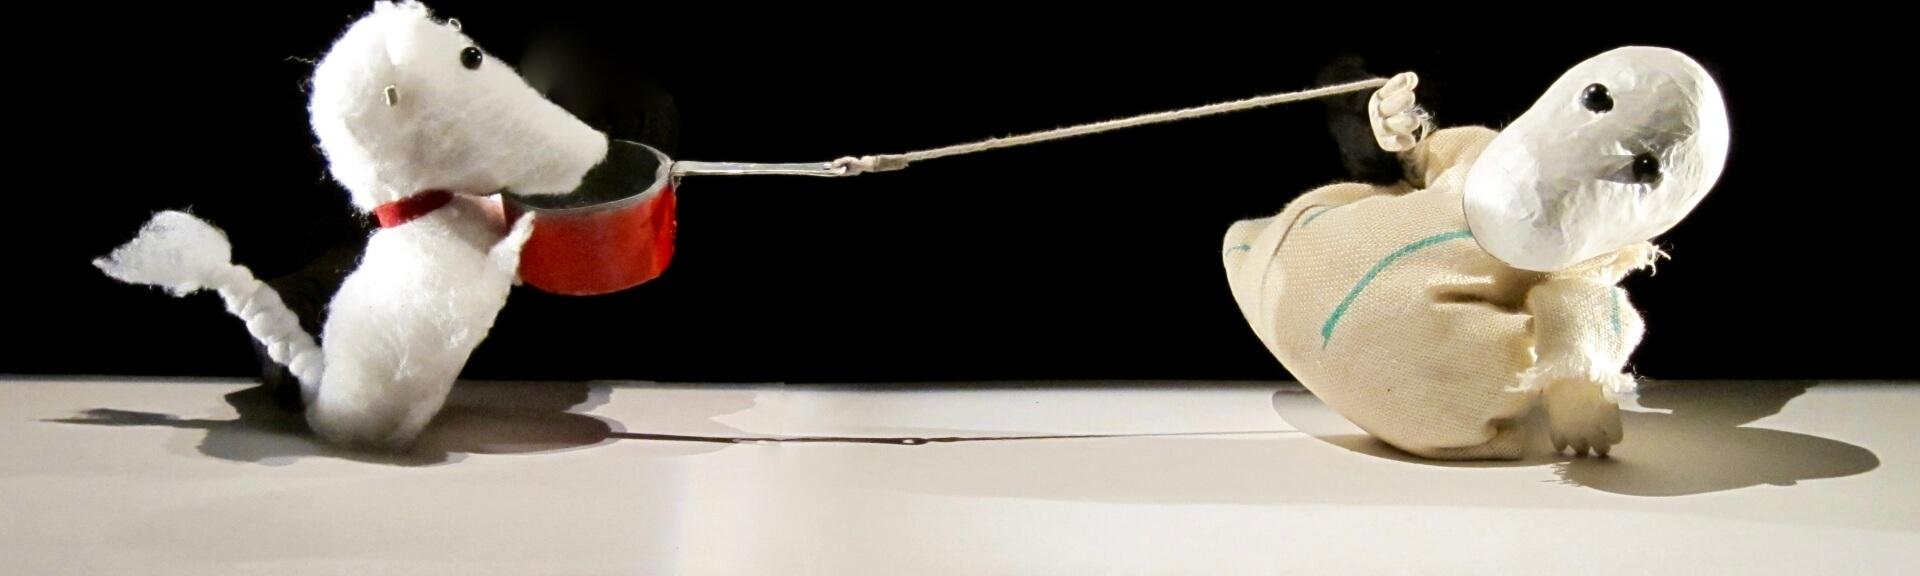 La Petite Casserole d'Anatole 2